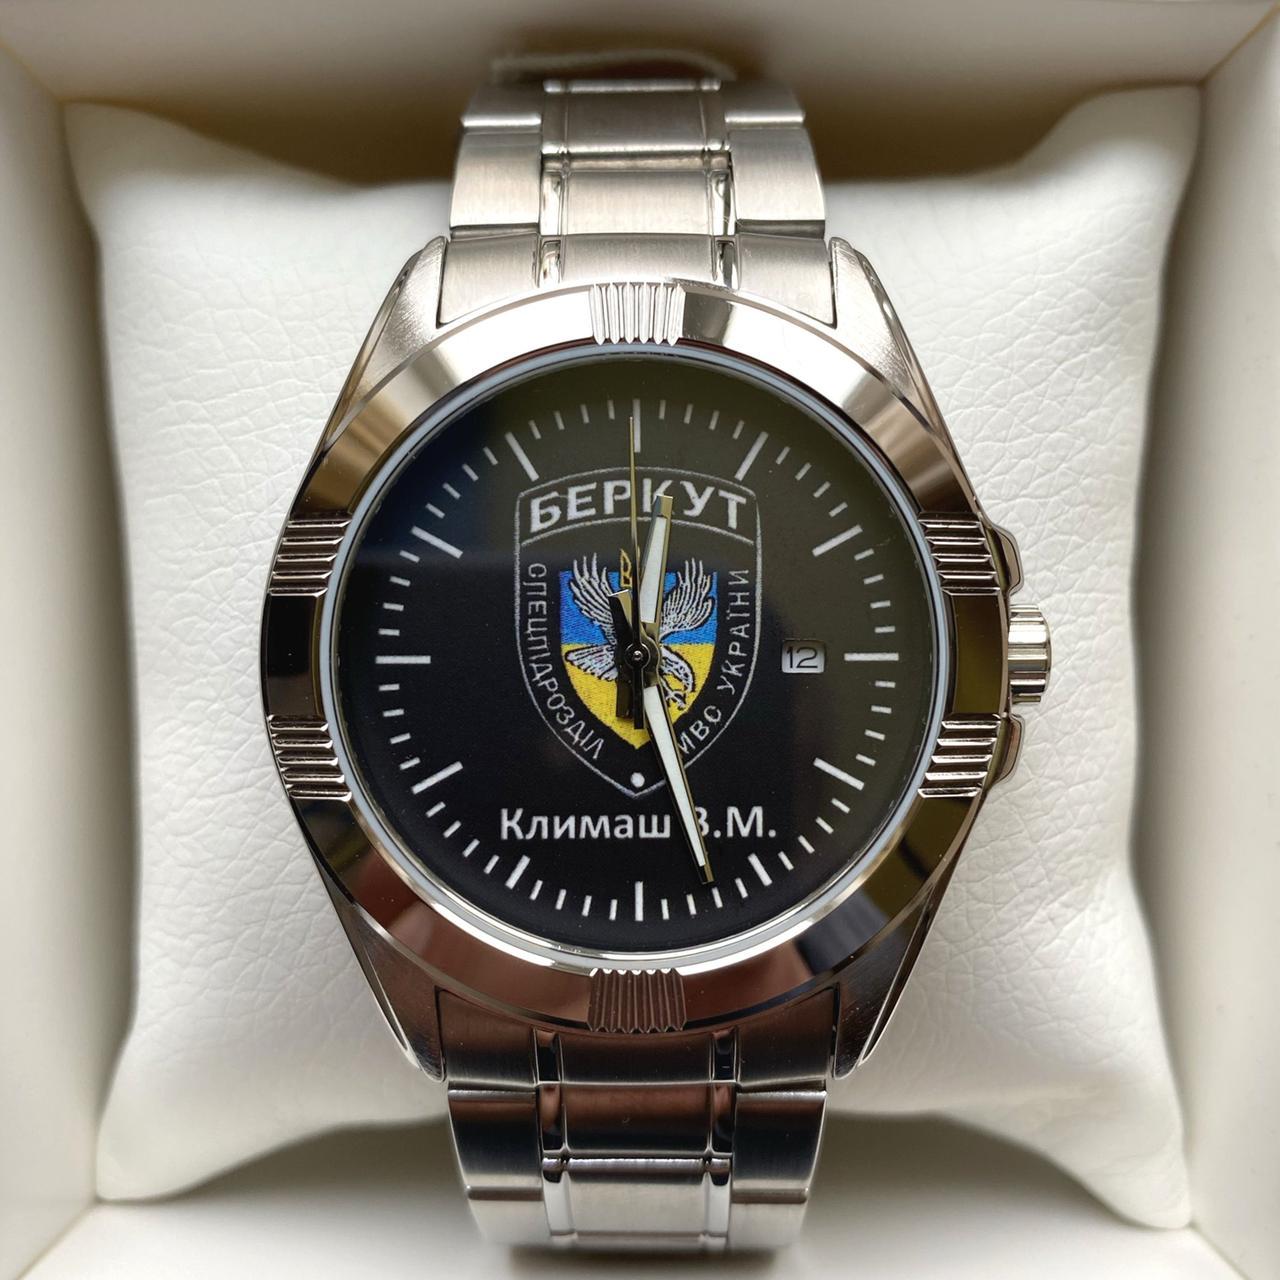 Годинник наручний Casio з логотипом Беркут